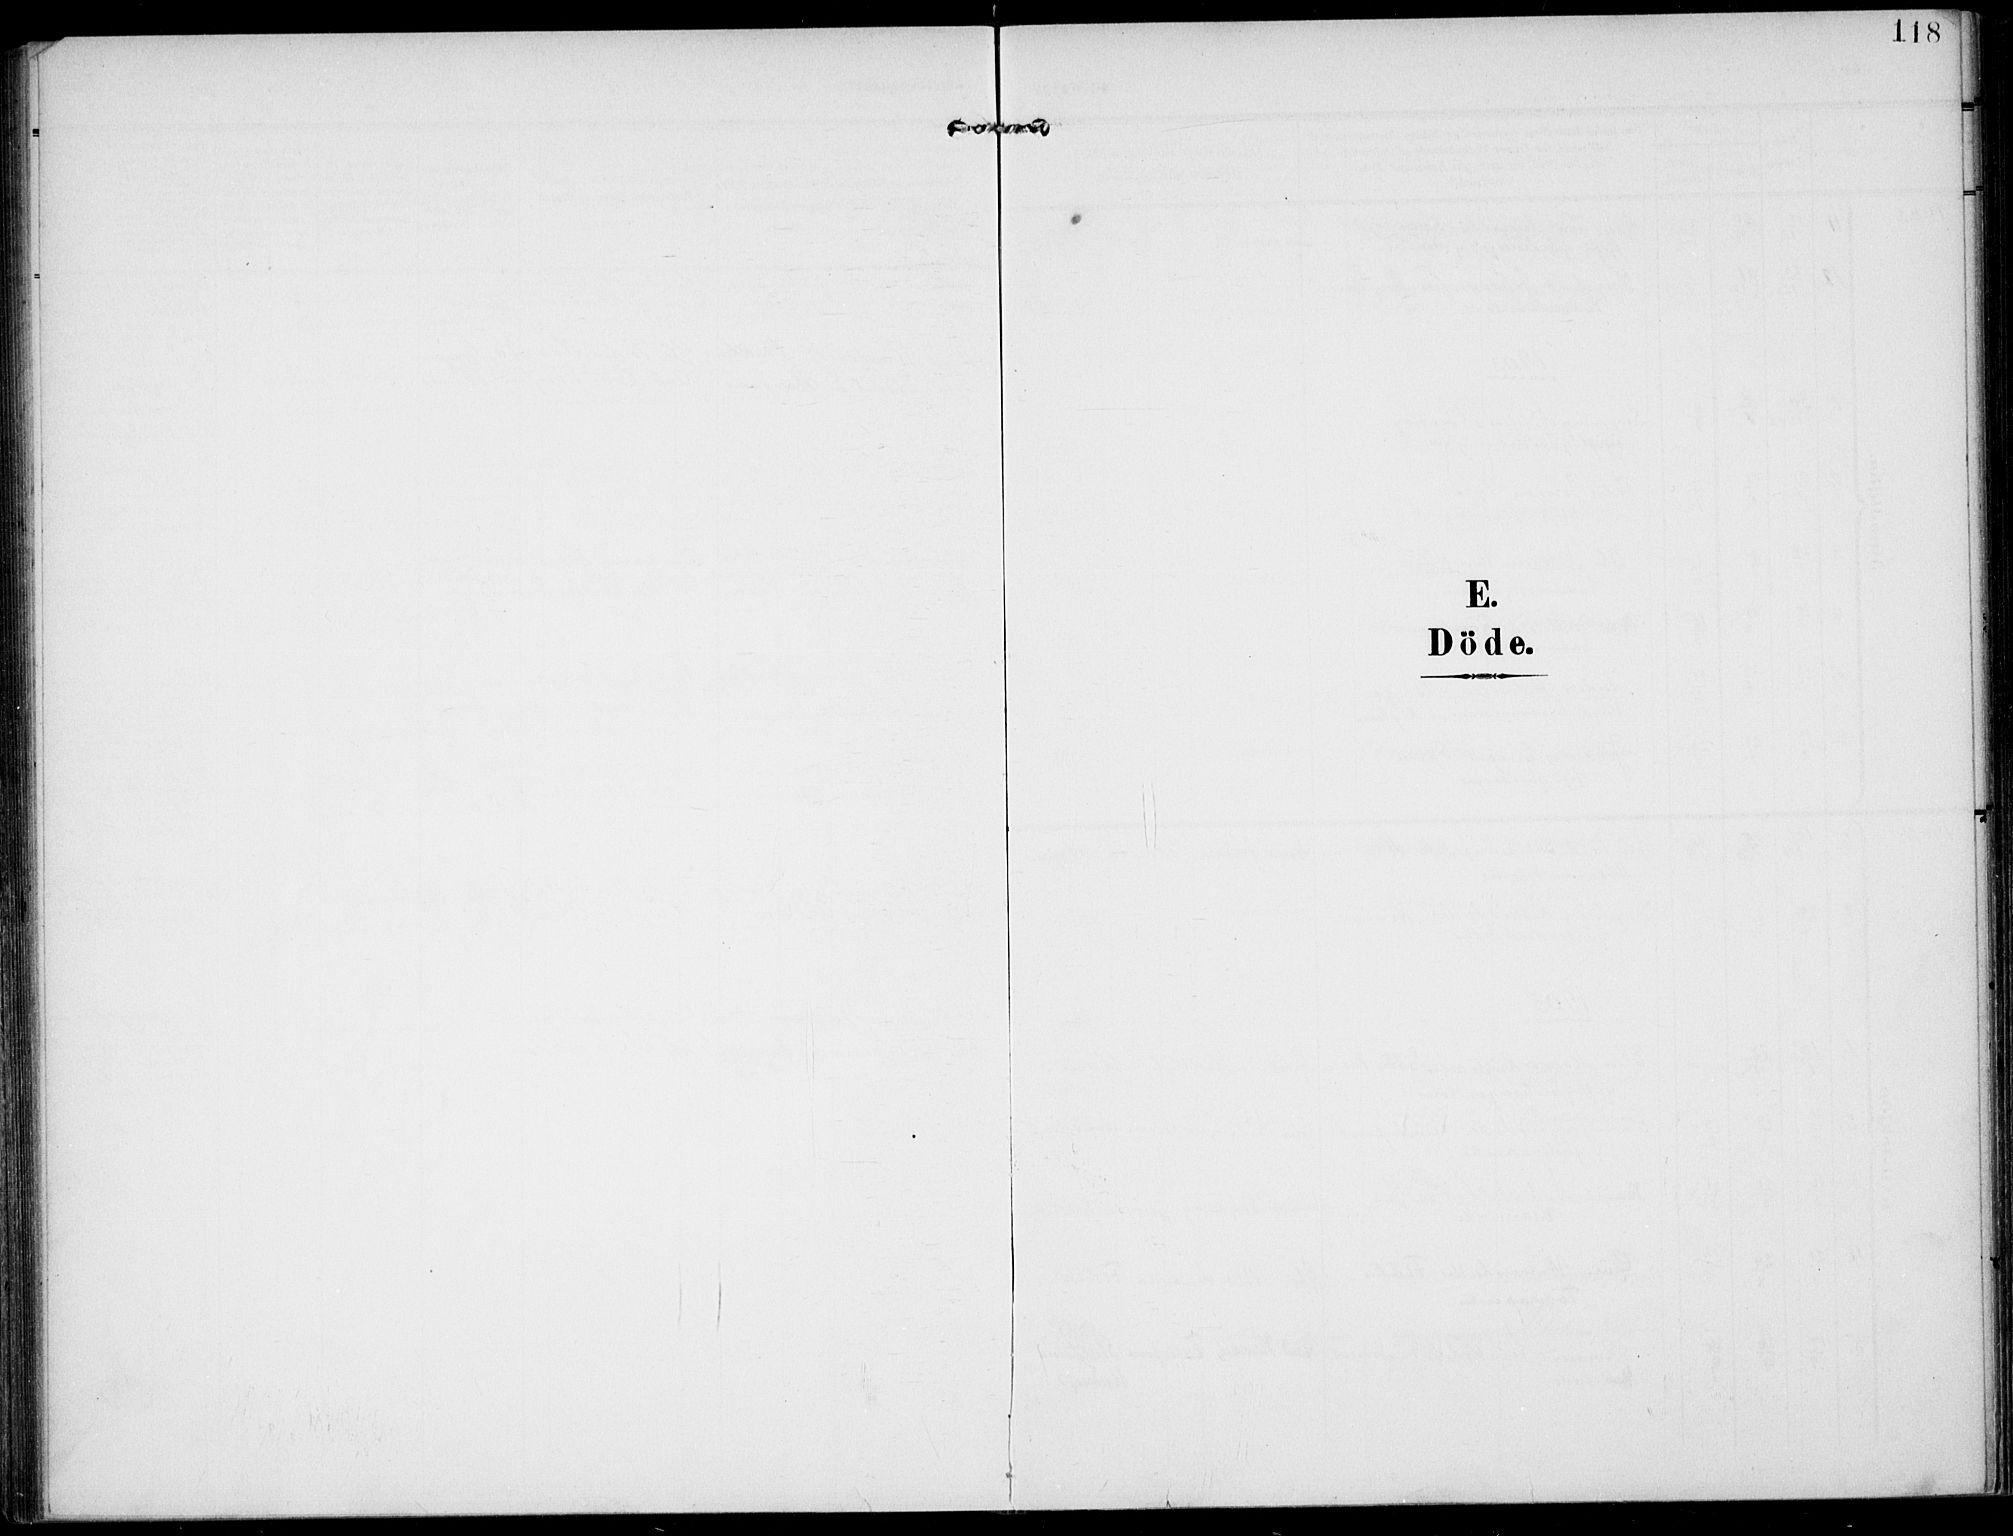 SAKO, Lunde kirkebøker, F/Fa/L0004: Ministerialbok nr. I 4, 1902-1913, s. 118